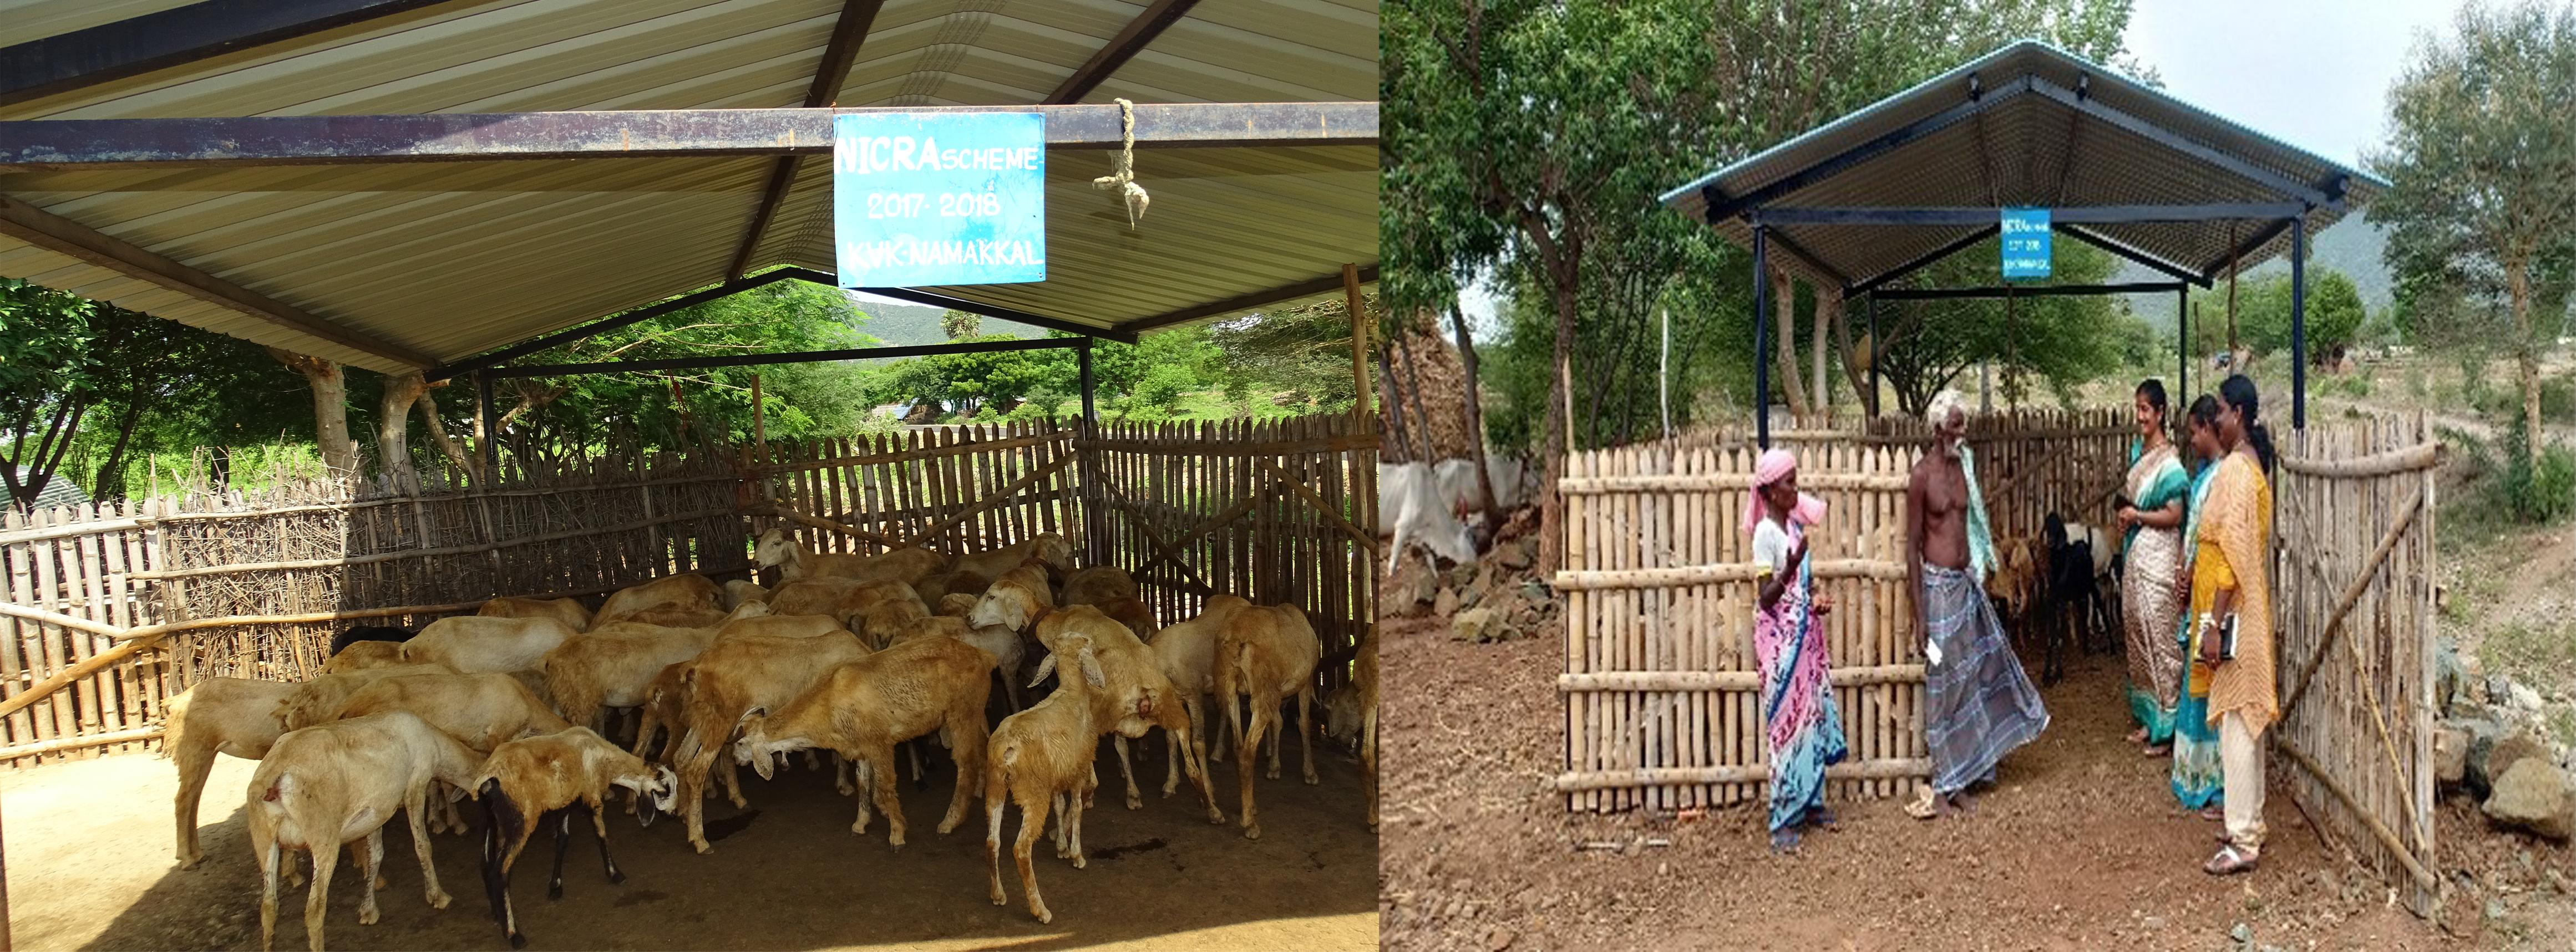 small ruminants shed